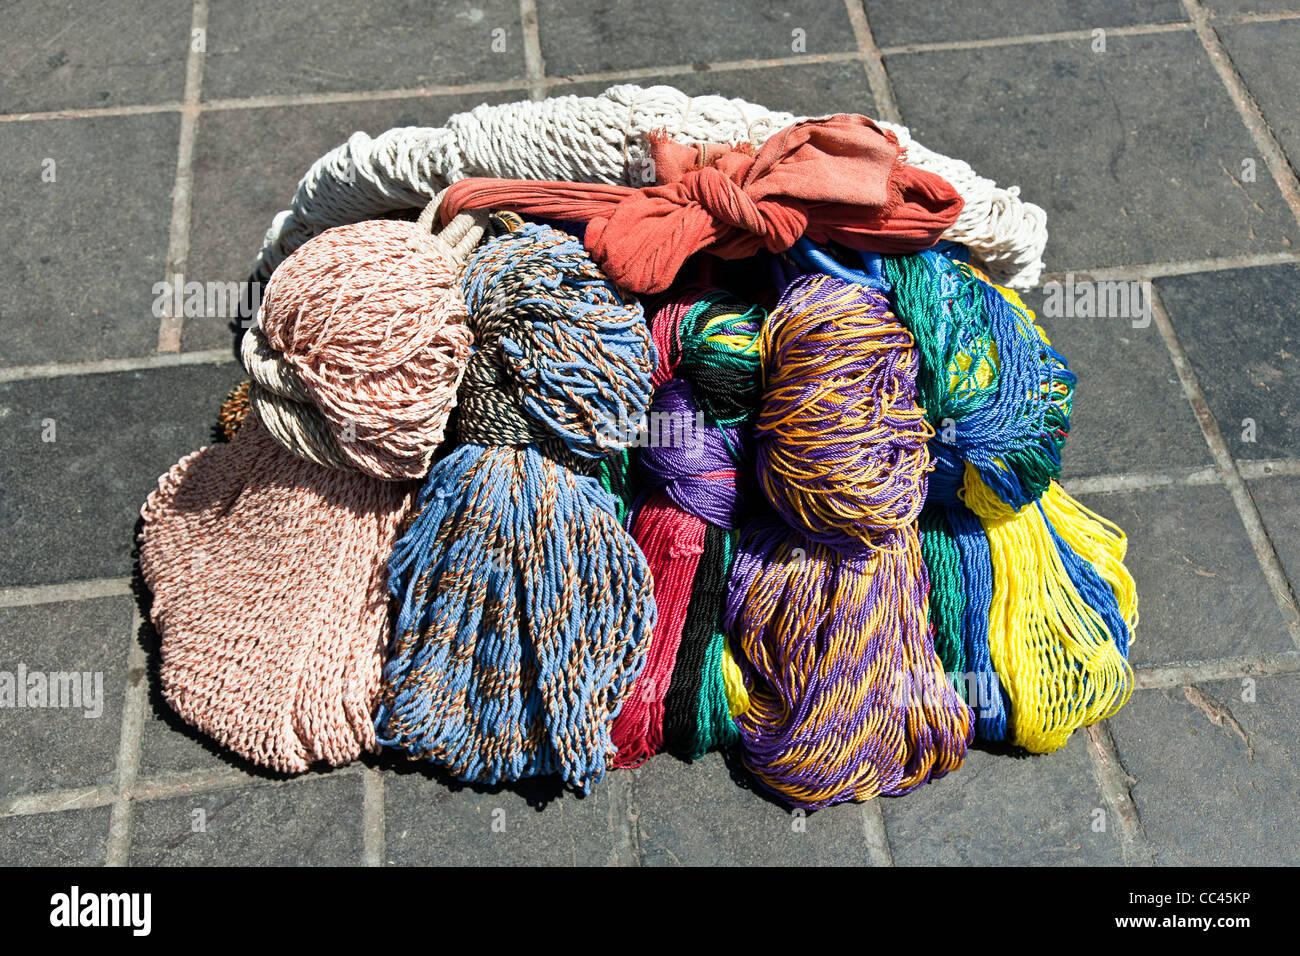 bundle of multicolored mesh hammocks sits on paving stones of Oaxaca Zocalo Mexico - Stock Image